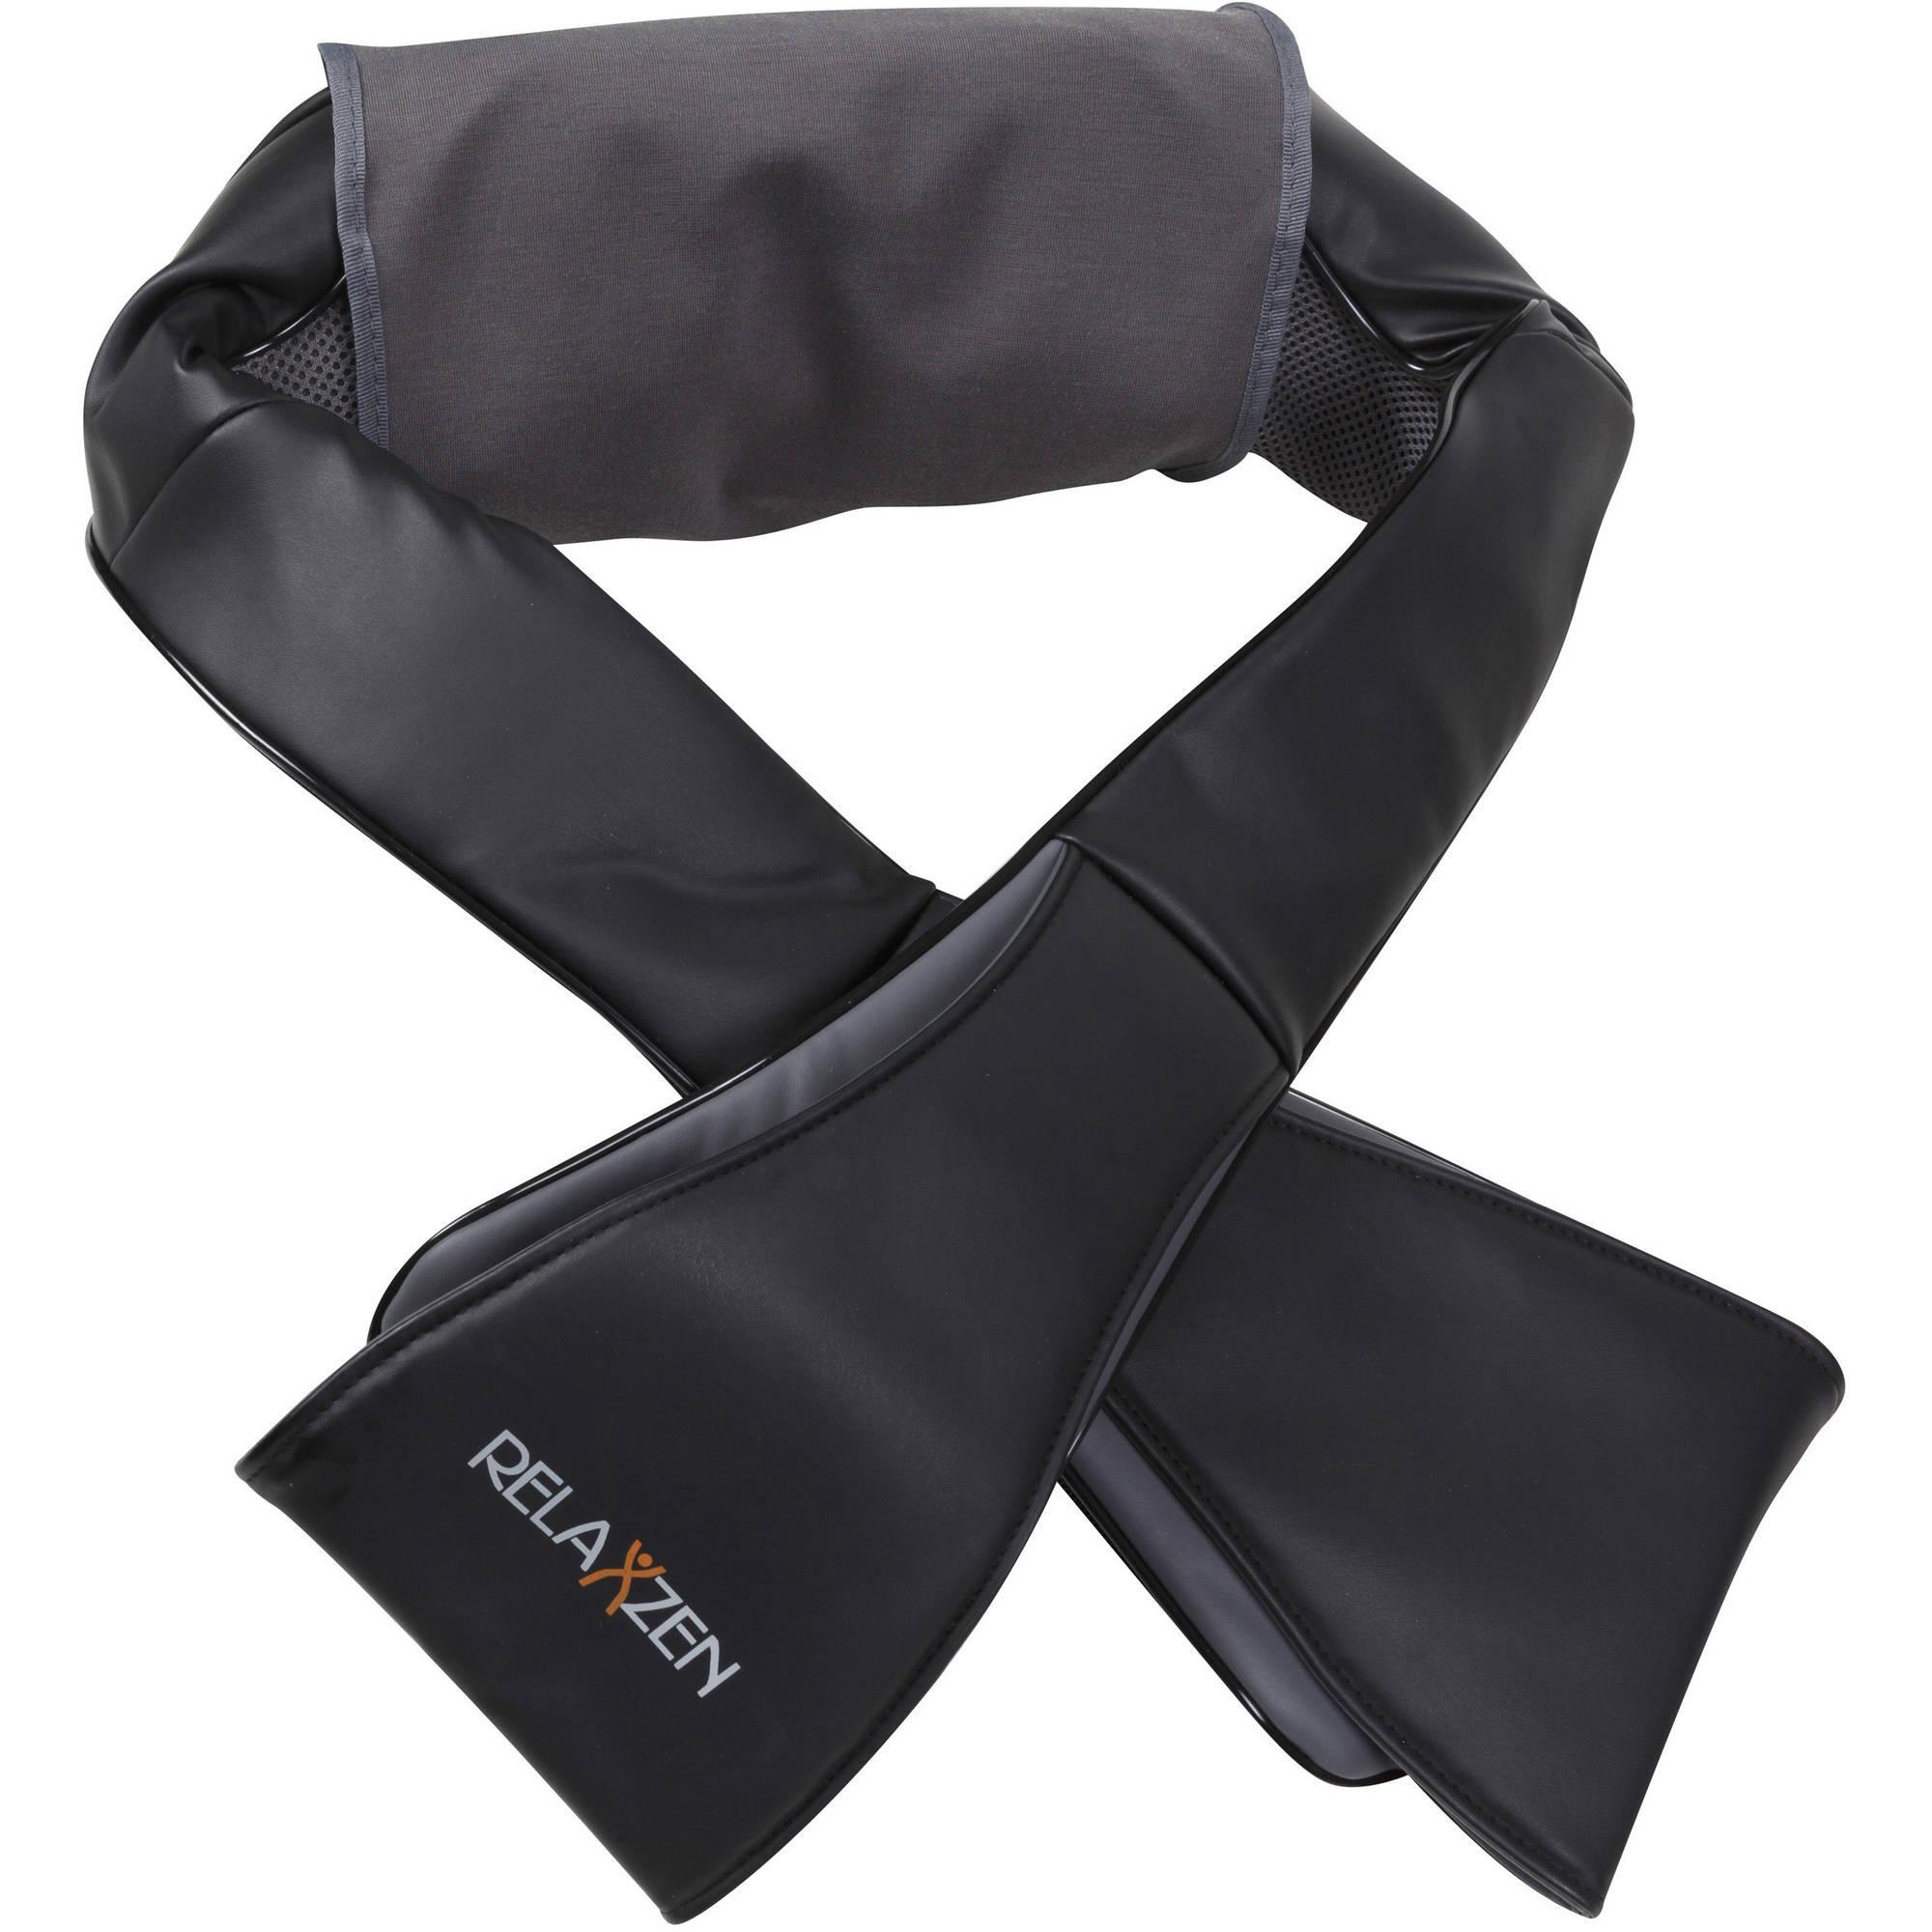 Relaxzen 60-2995 Shiatsu Neck and Shoulder Massager, Black and Gray